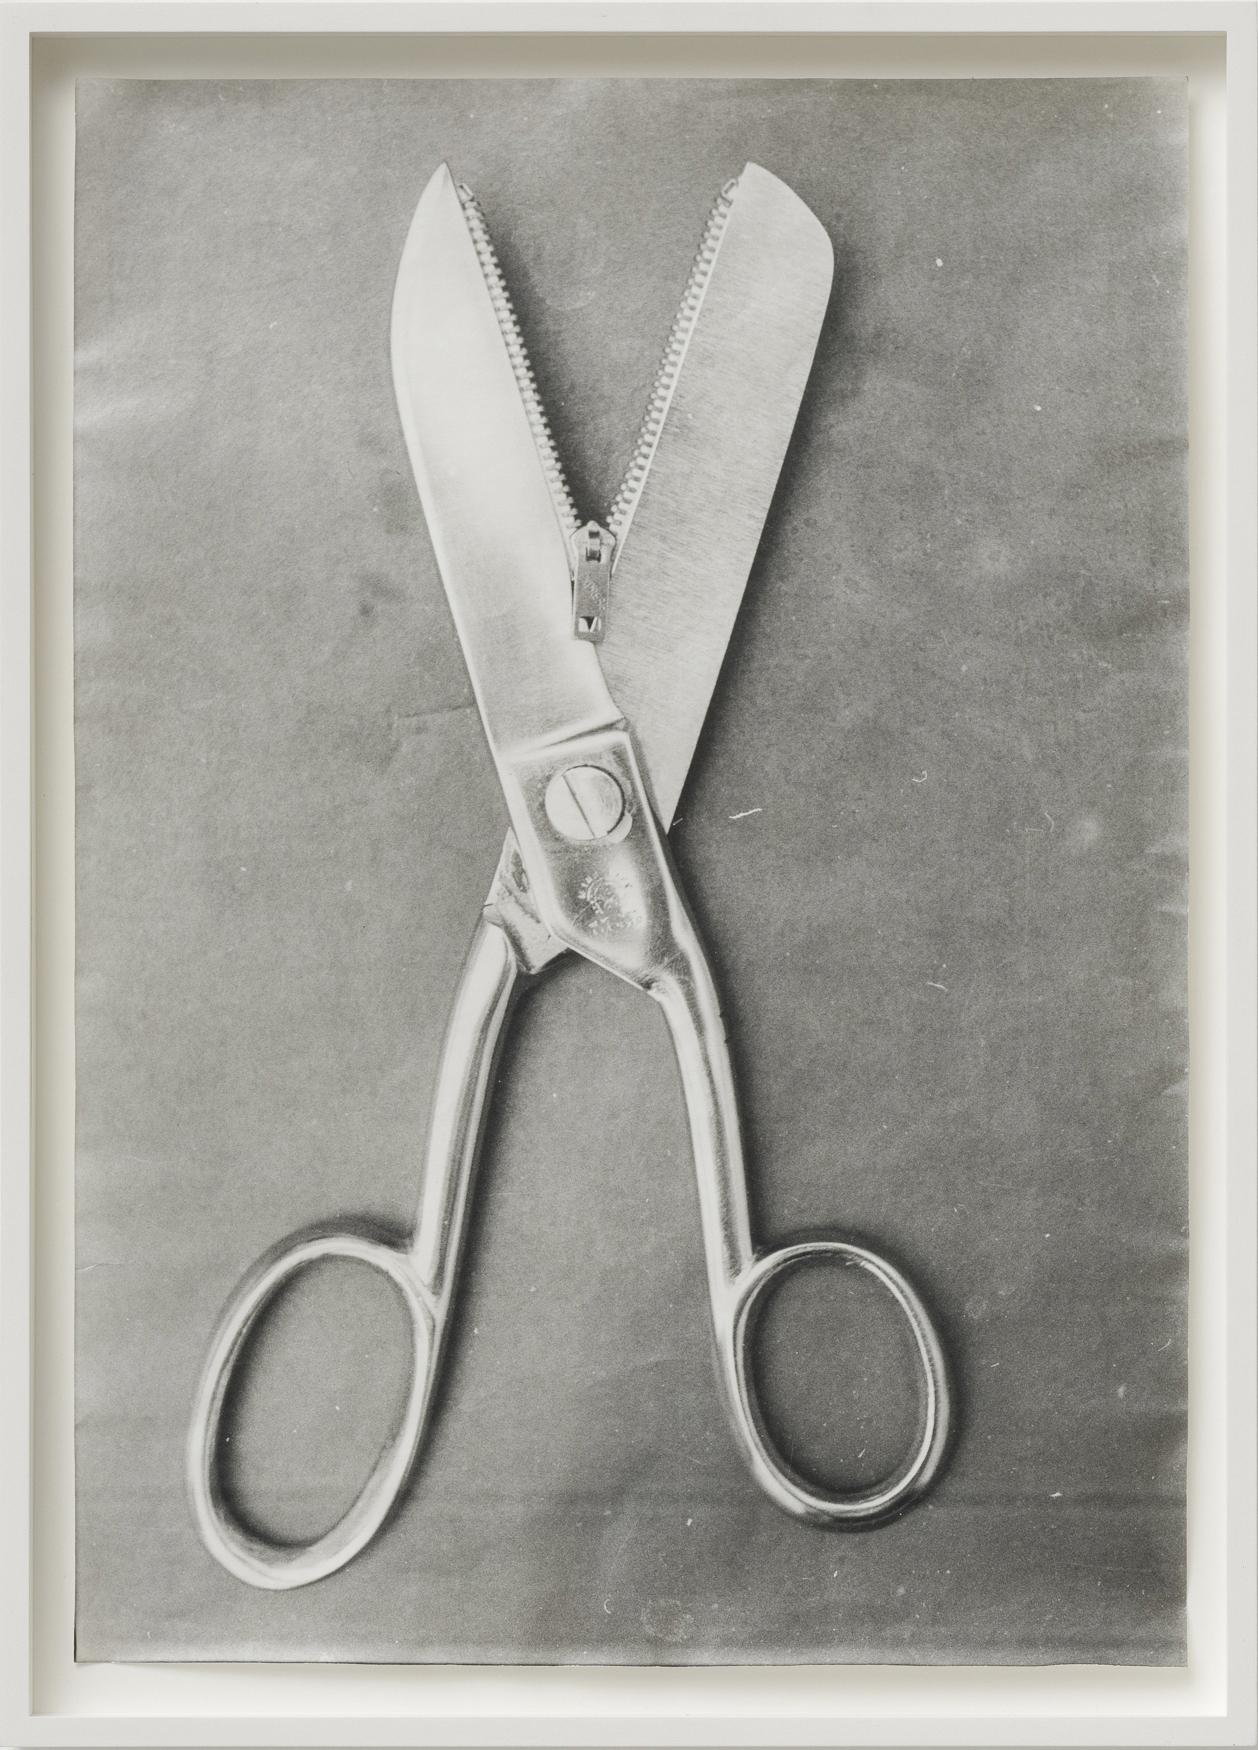 Ferenc Ficzek, Untitled (Scissors), 1977, silver gelatin print on Dokubrom paper, 45,5 x 33 cm. Photo: Marcus Schneider